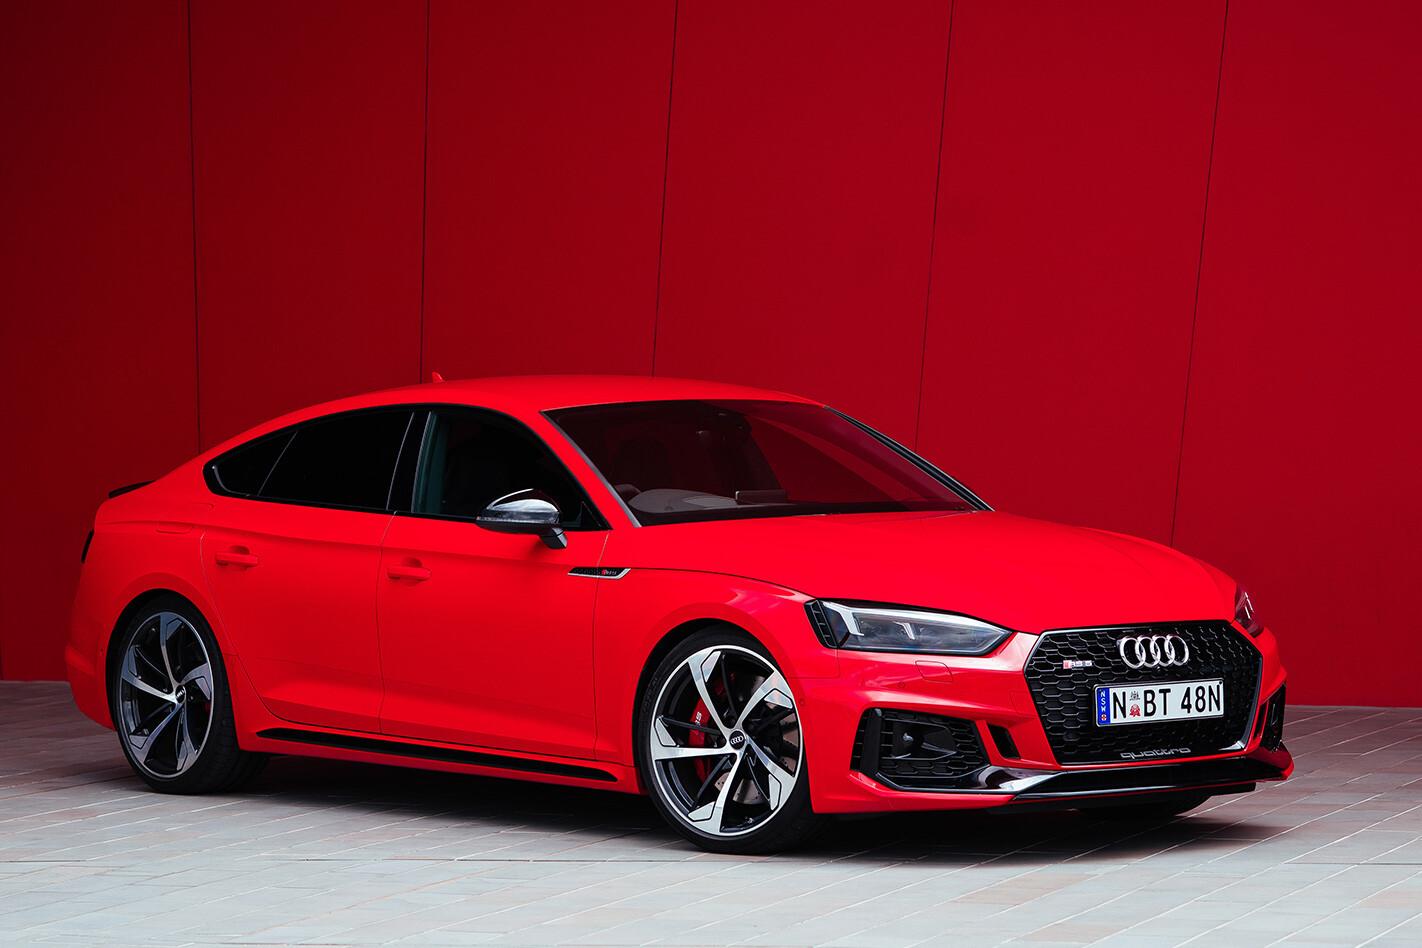 Audi Rs 5 Nosee Jpg